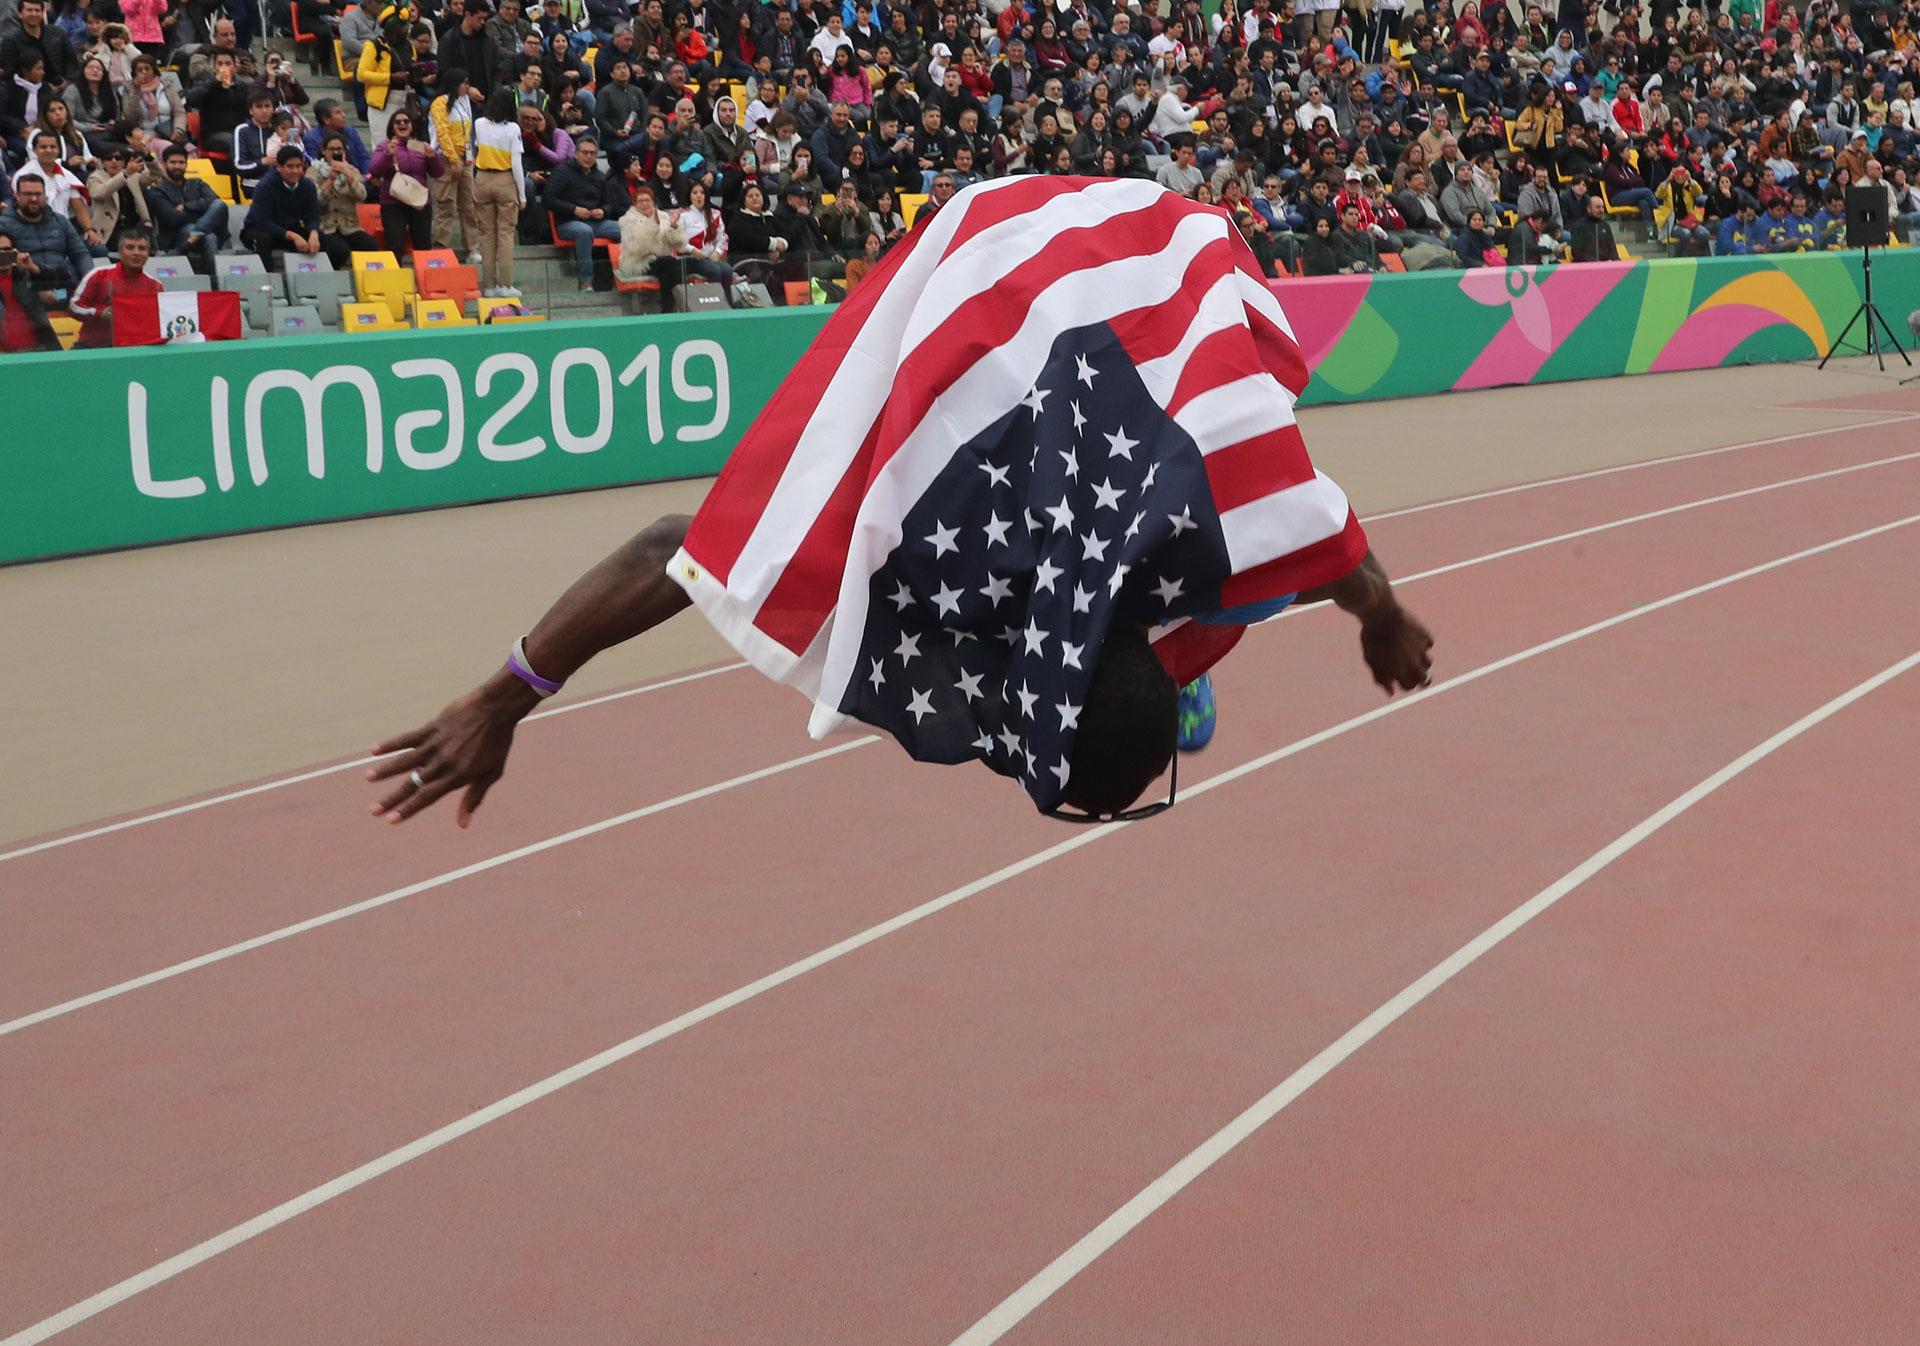 XVIII Pan American Games - Lima 2019 - Athletics - Men's Triple Jump Final - Athletics Stadium, Lima, Peru - August 10, 2019. Omar Craddock of the U.S. celebrates winning the gold medal in the event. REUTERS/Henry Romero